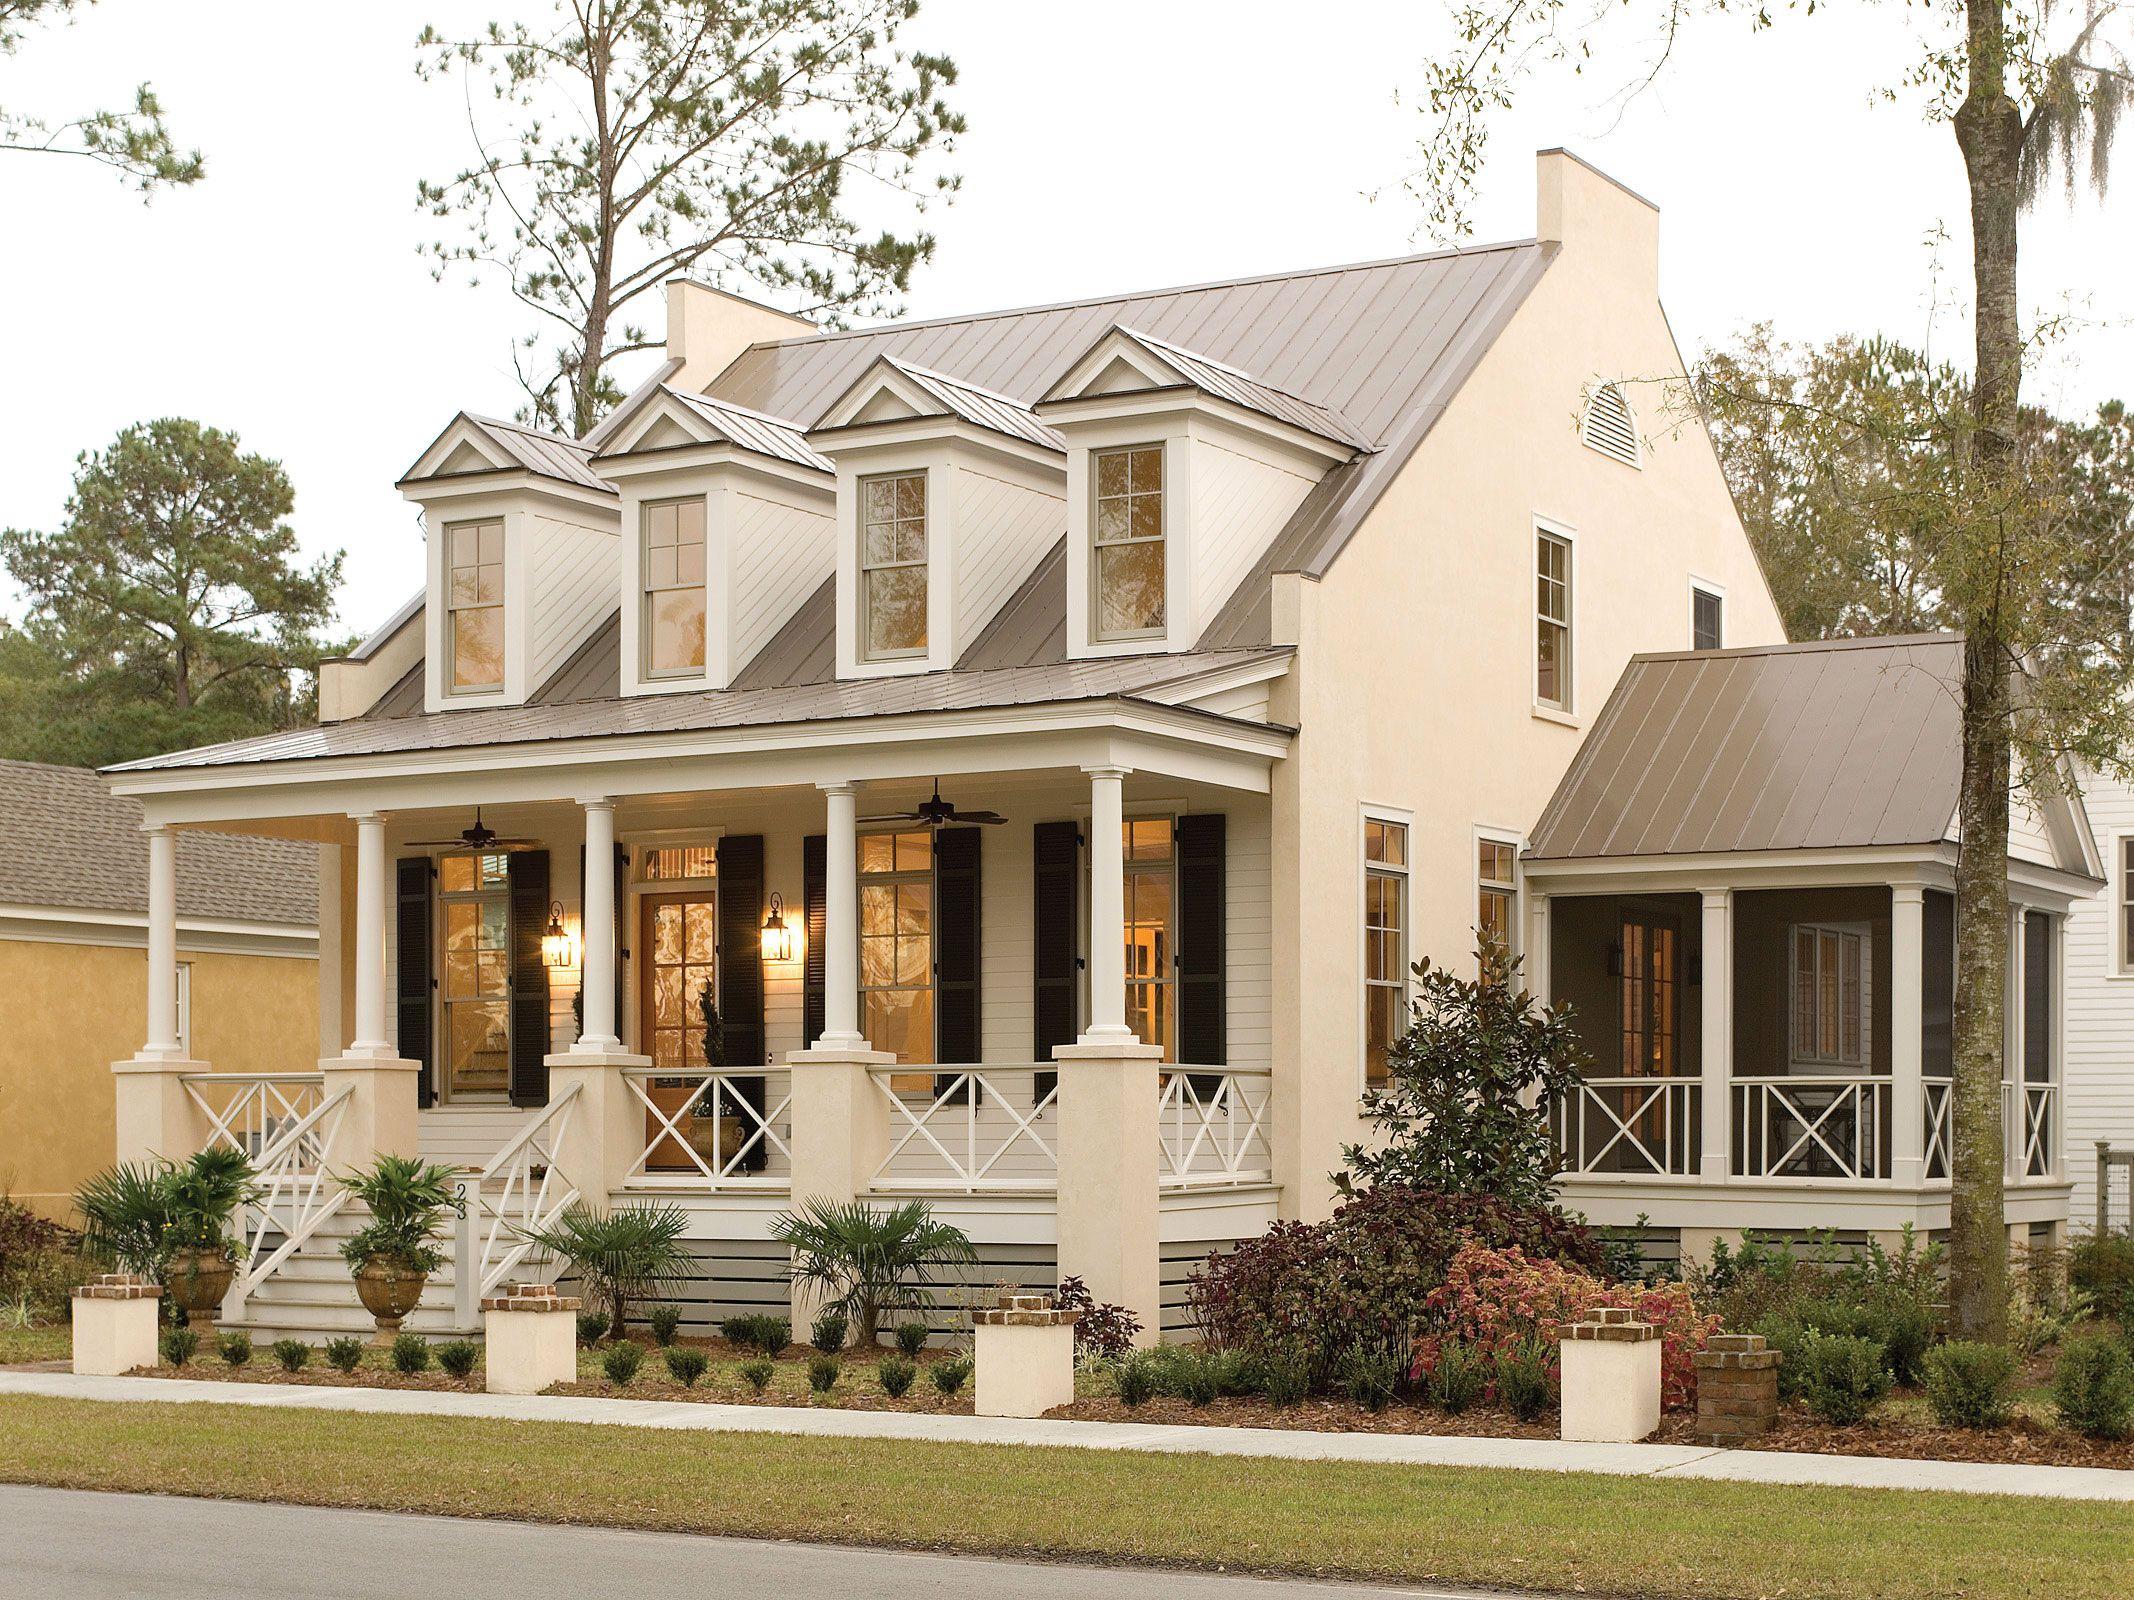 Eastover Cottage Plan 1666 exteriors Pinterest House